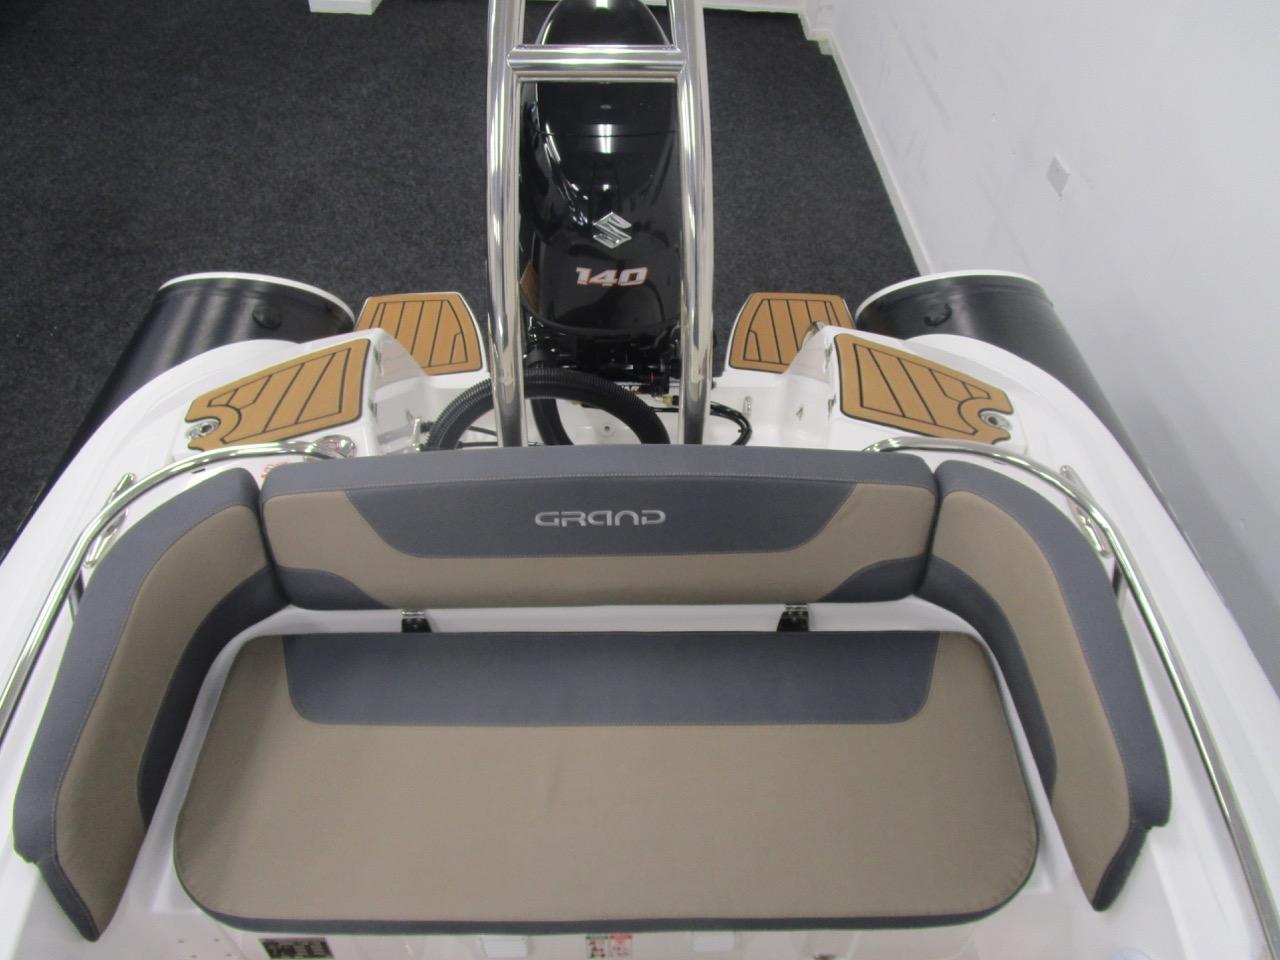 GRAND Golden Line G580 RIB rear seat